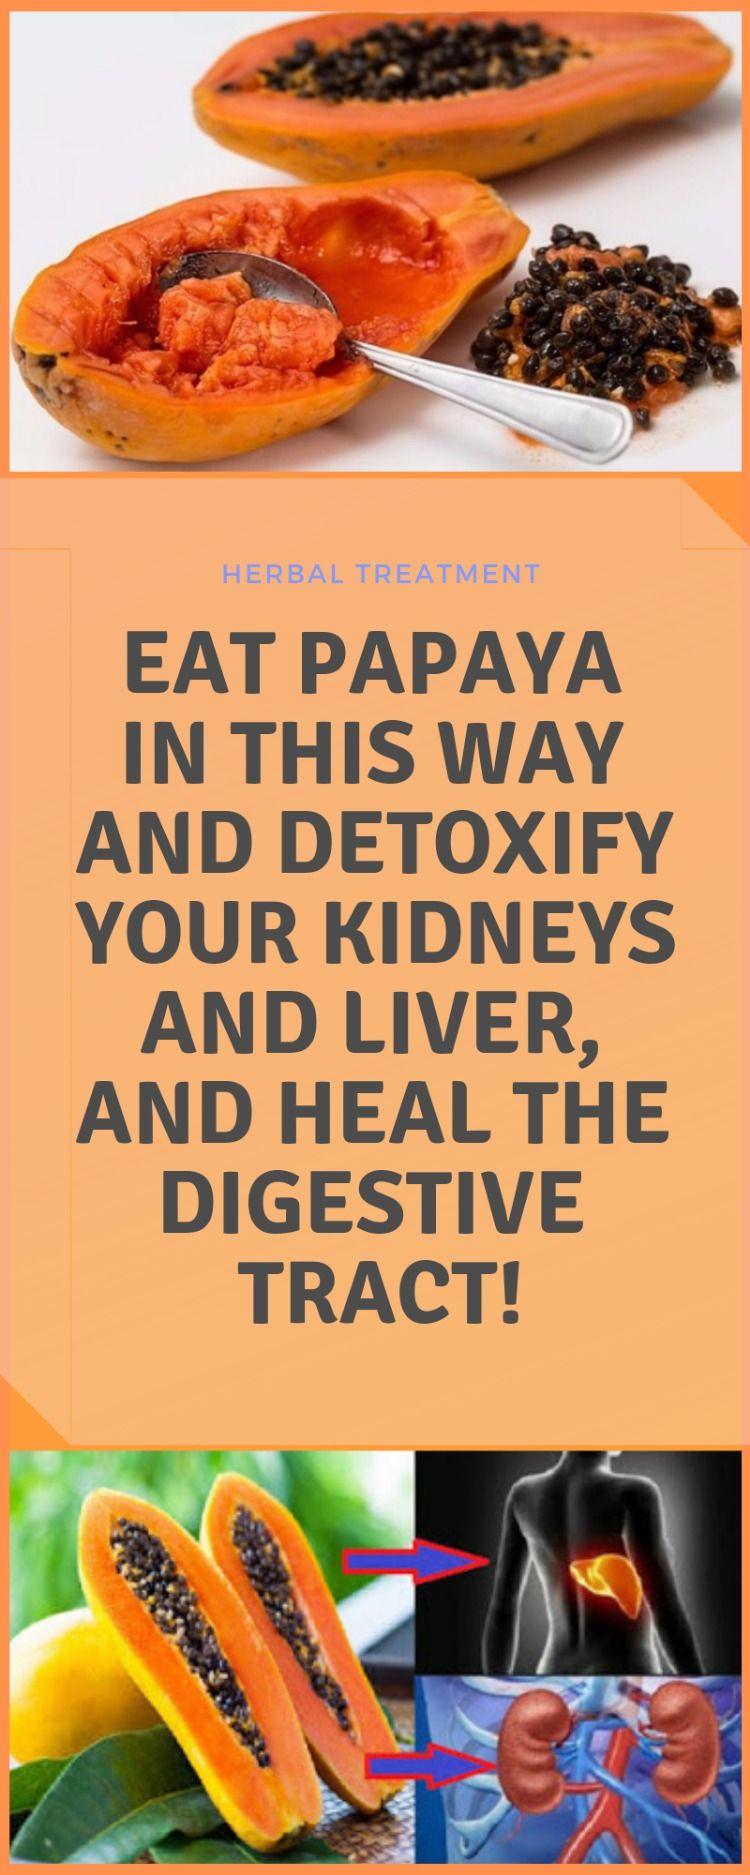 Carica Papaya or Papaya fruit is also called pawpaw or papaw, and it